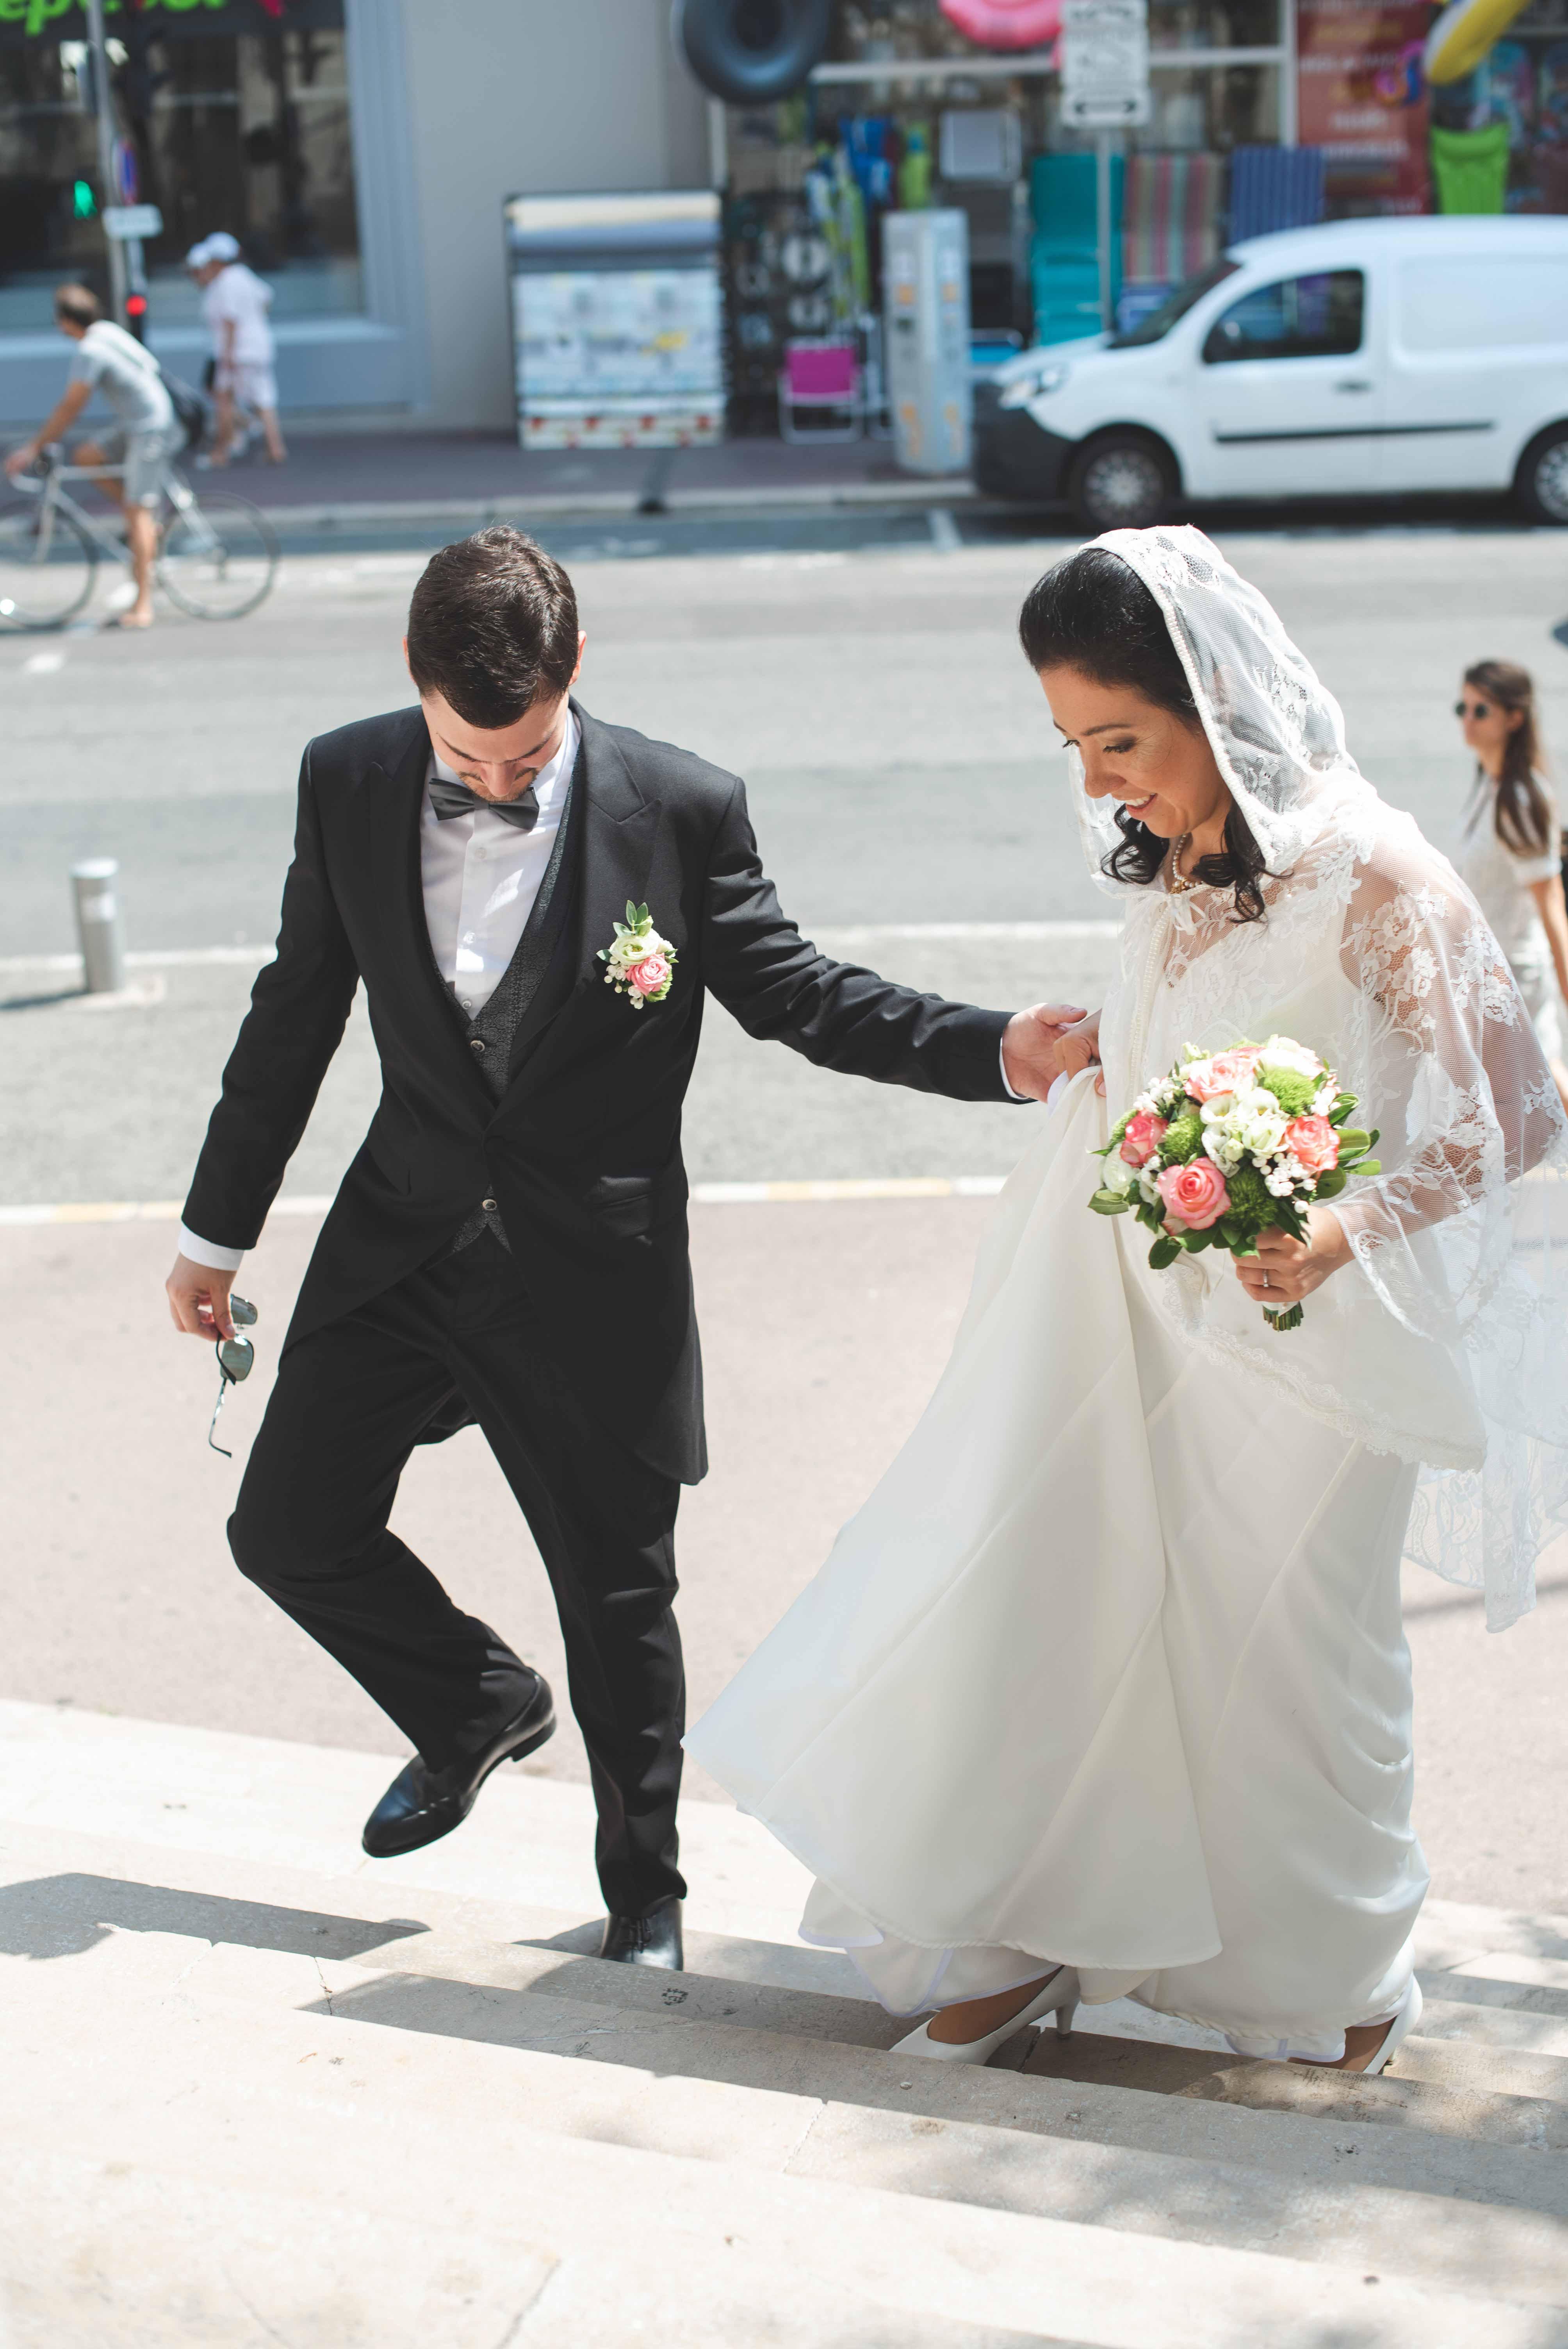 Photographe professionnel de mariage Nice 06